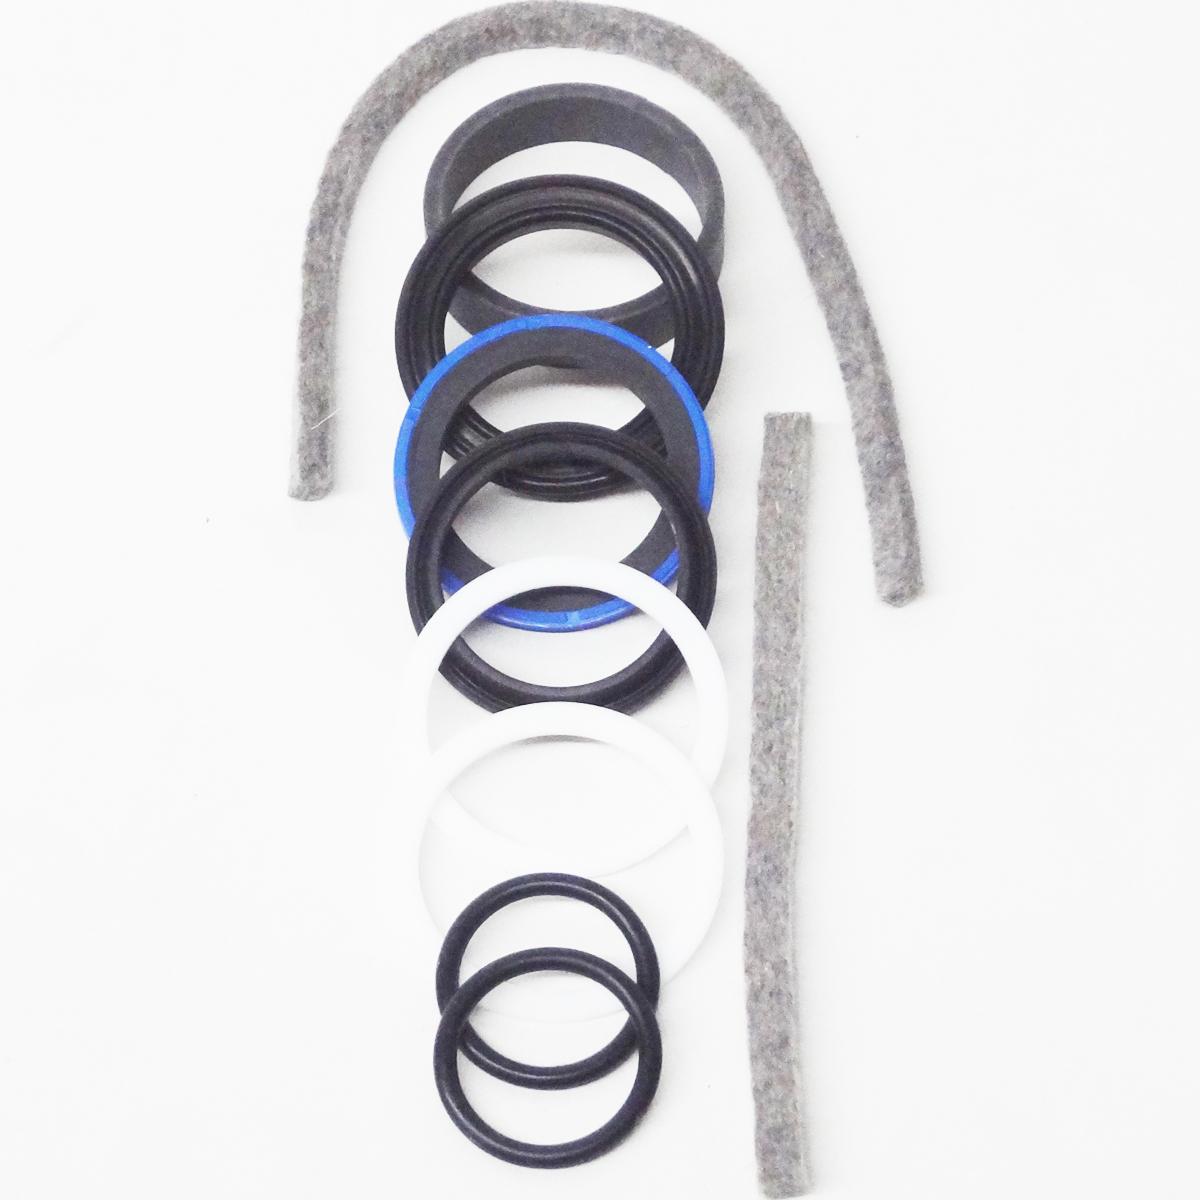 Rotary Lift Cylinder Parts : Rotary lift cylinder seal kit rebuild fj th